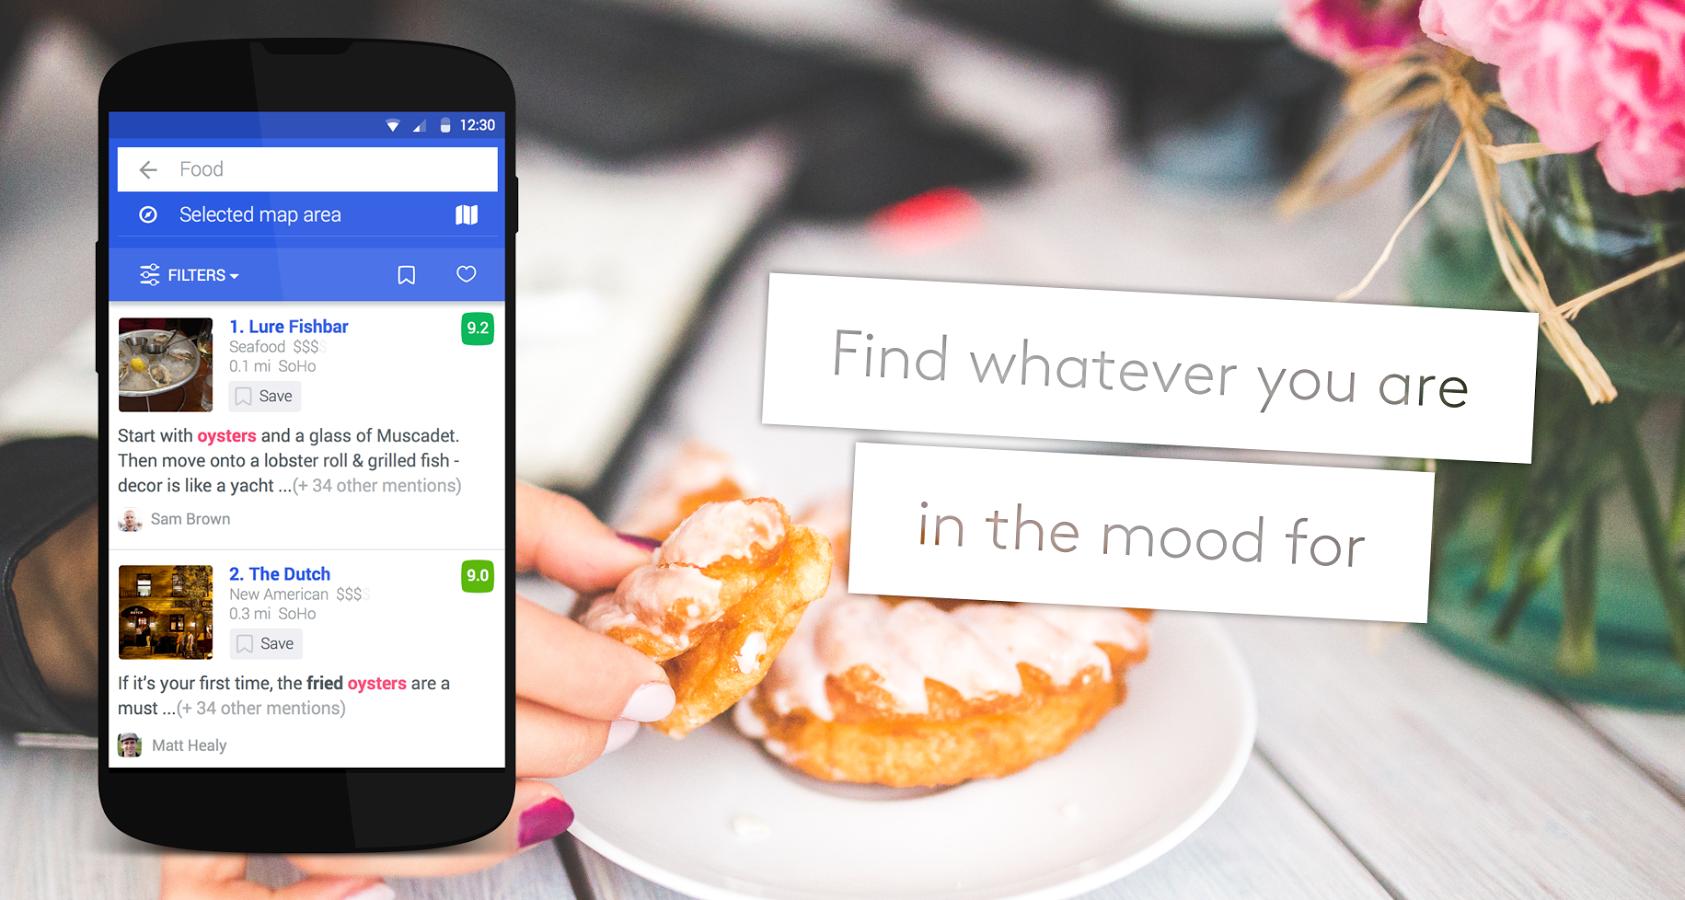 Foursquare-restaurants-near-me-finding-app